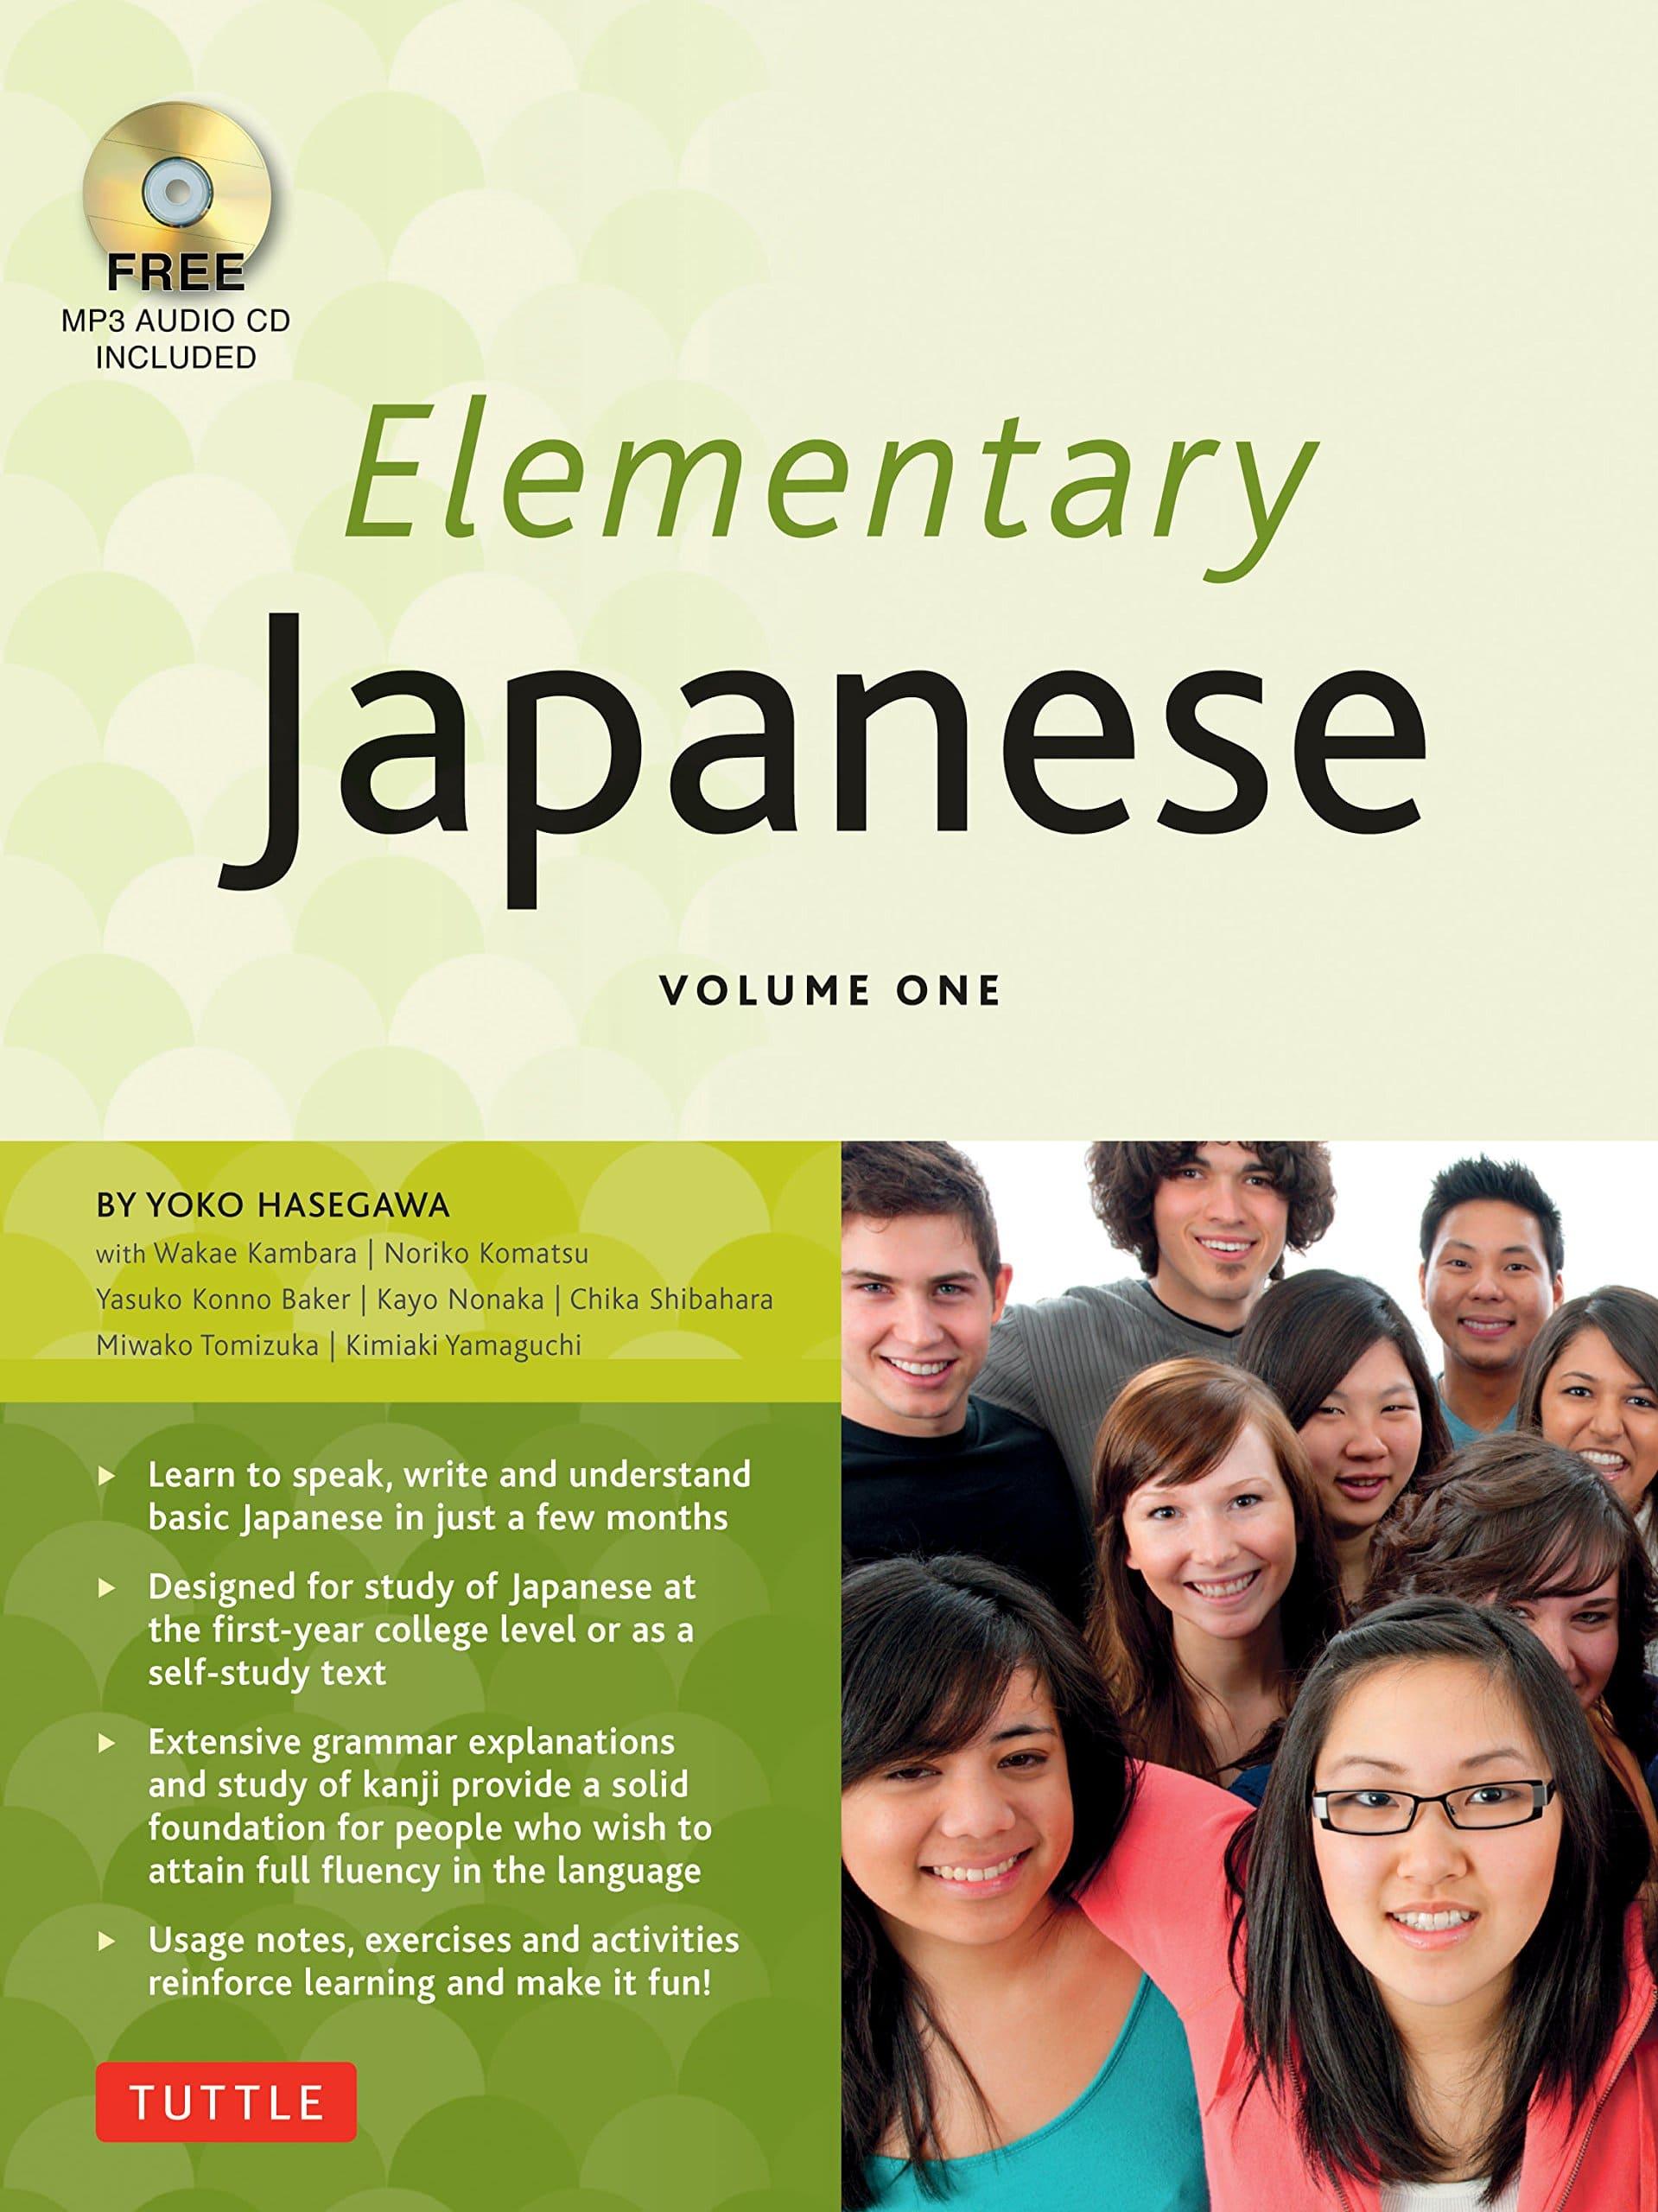 Aprender japonés con Elementary Japanese